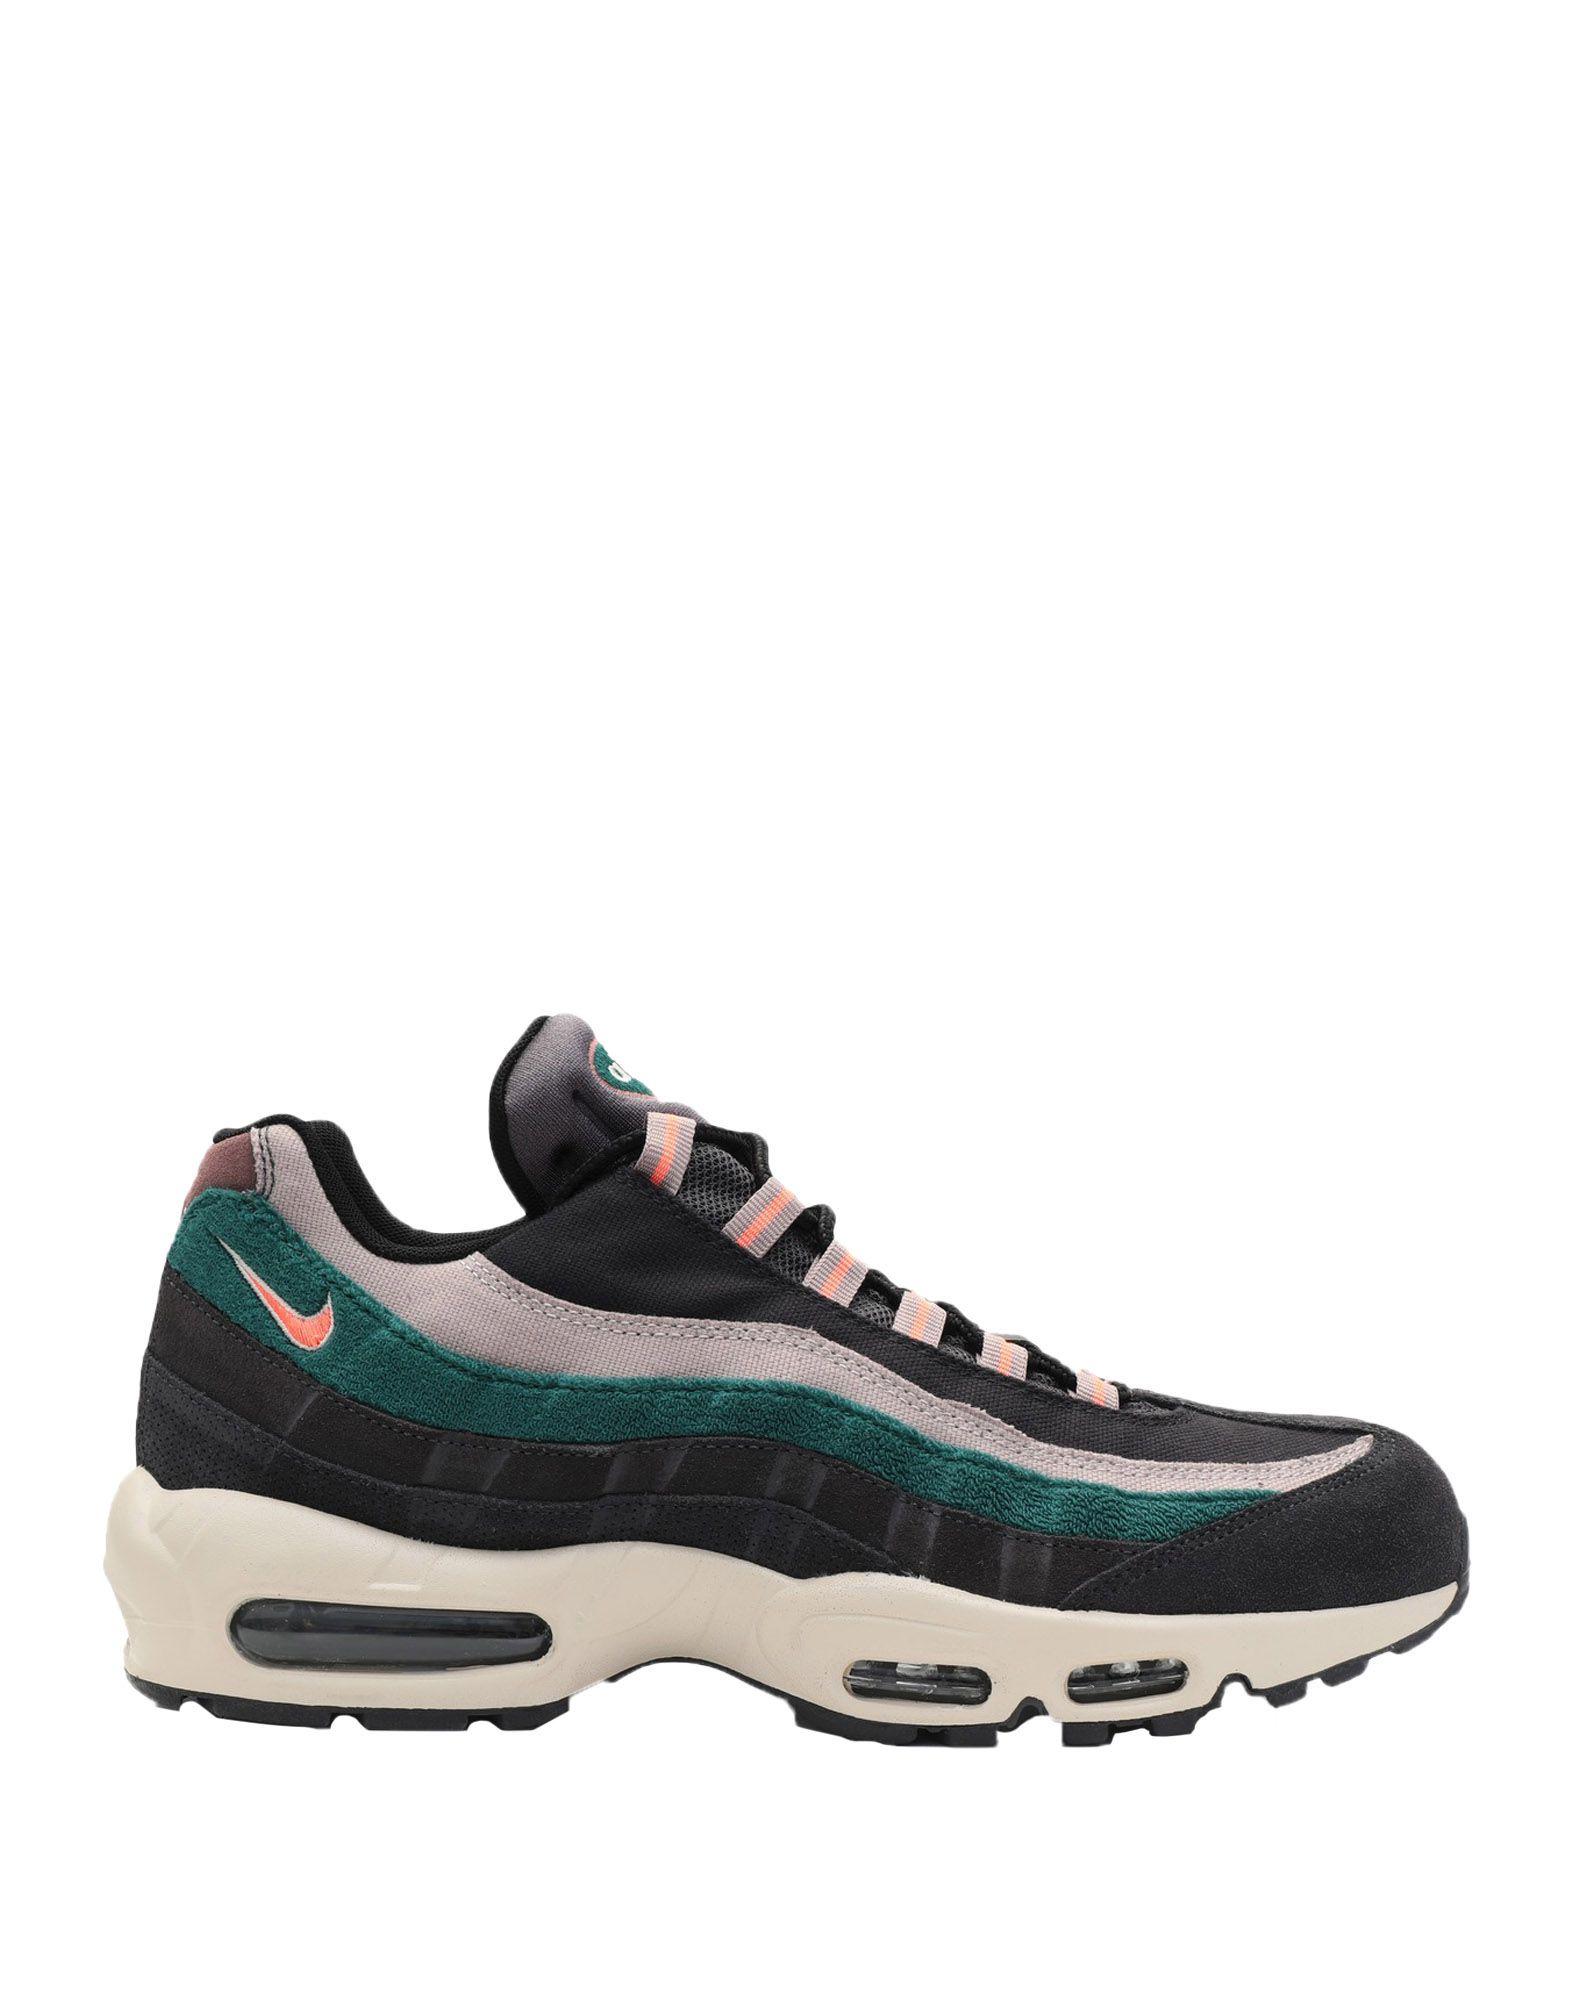 Zapatillas Nike Air Max 95 Premium - - Premium Hombre - Zapatillas Nike  Gris marengo 90d57b